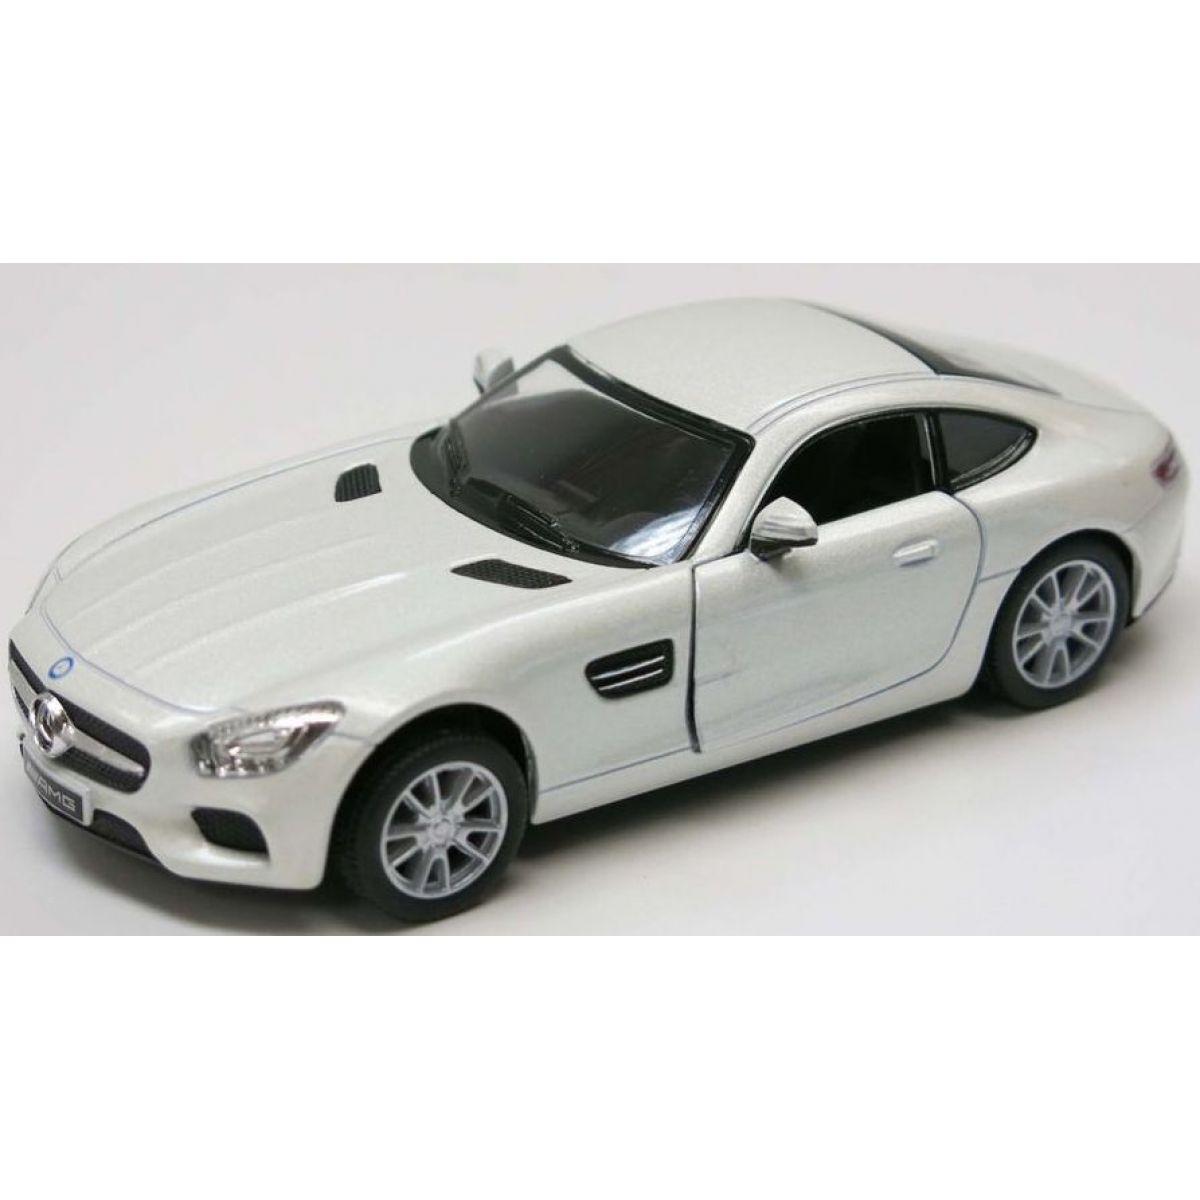 HM Studio Mercedes AMG GT biely